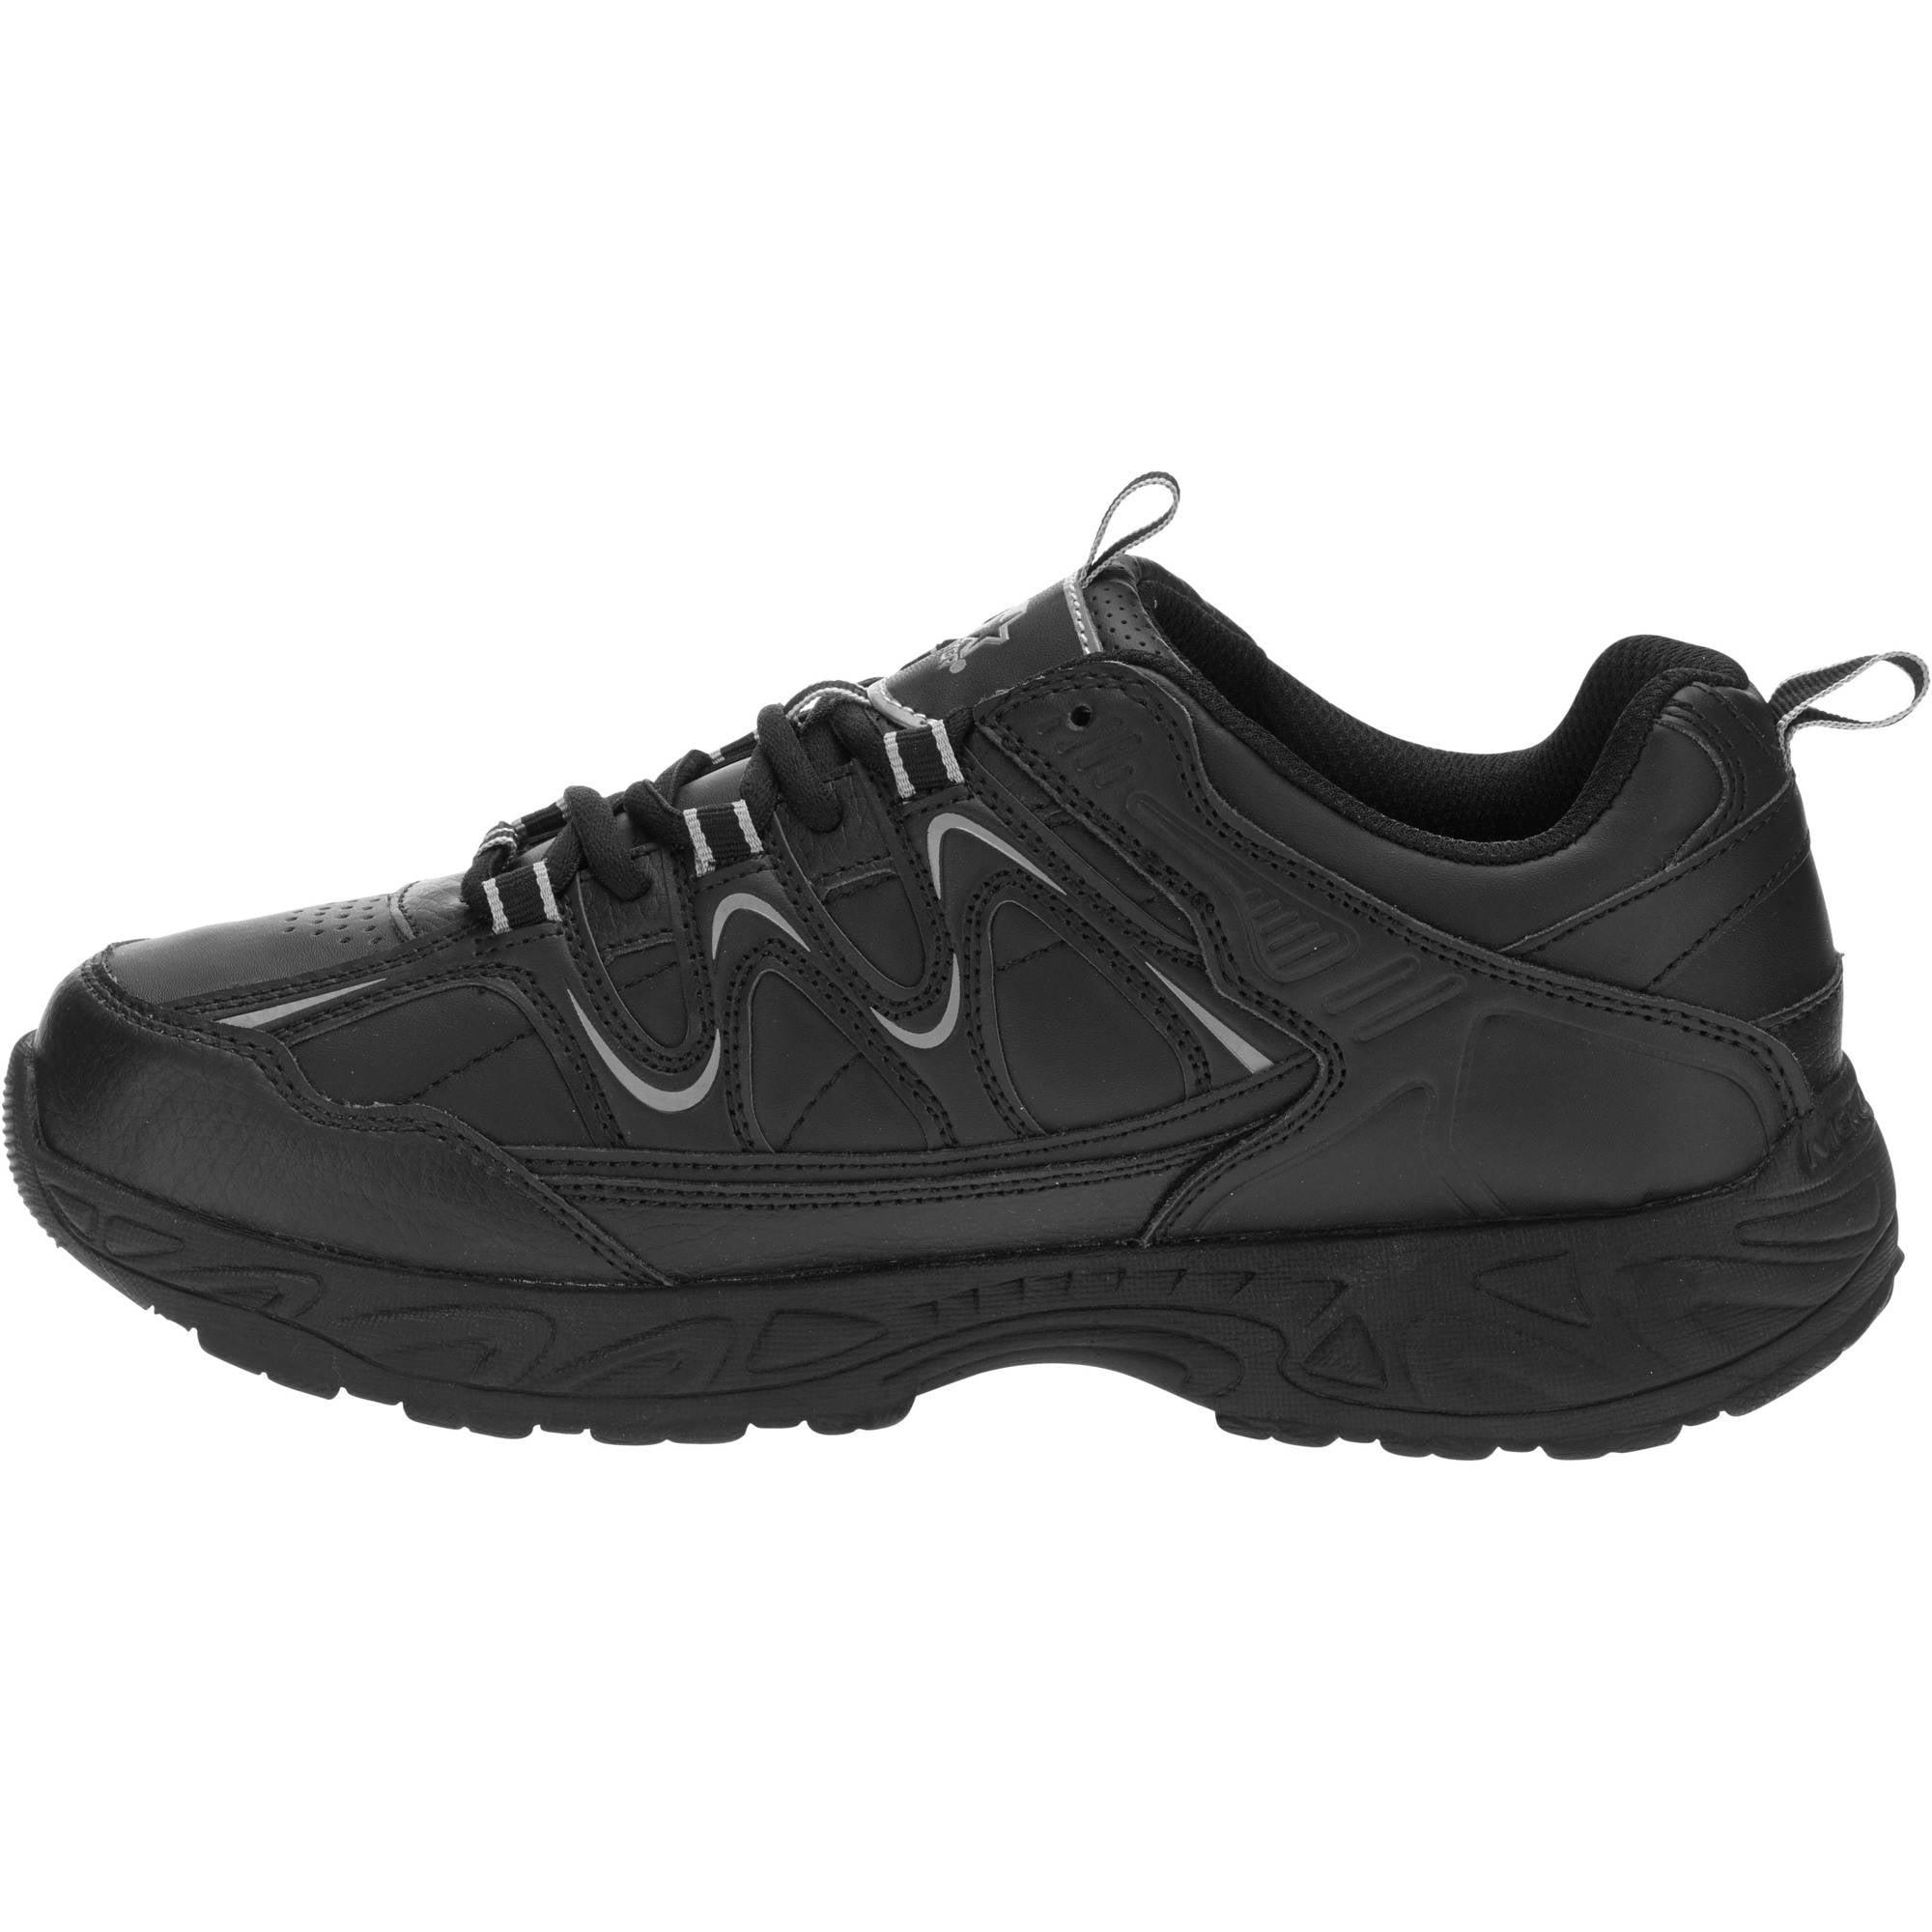 7e7cd359829103 Starter - Starter Men s Chunky Wide Width Athletic Shoe - Walmart.com